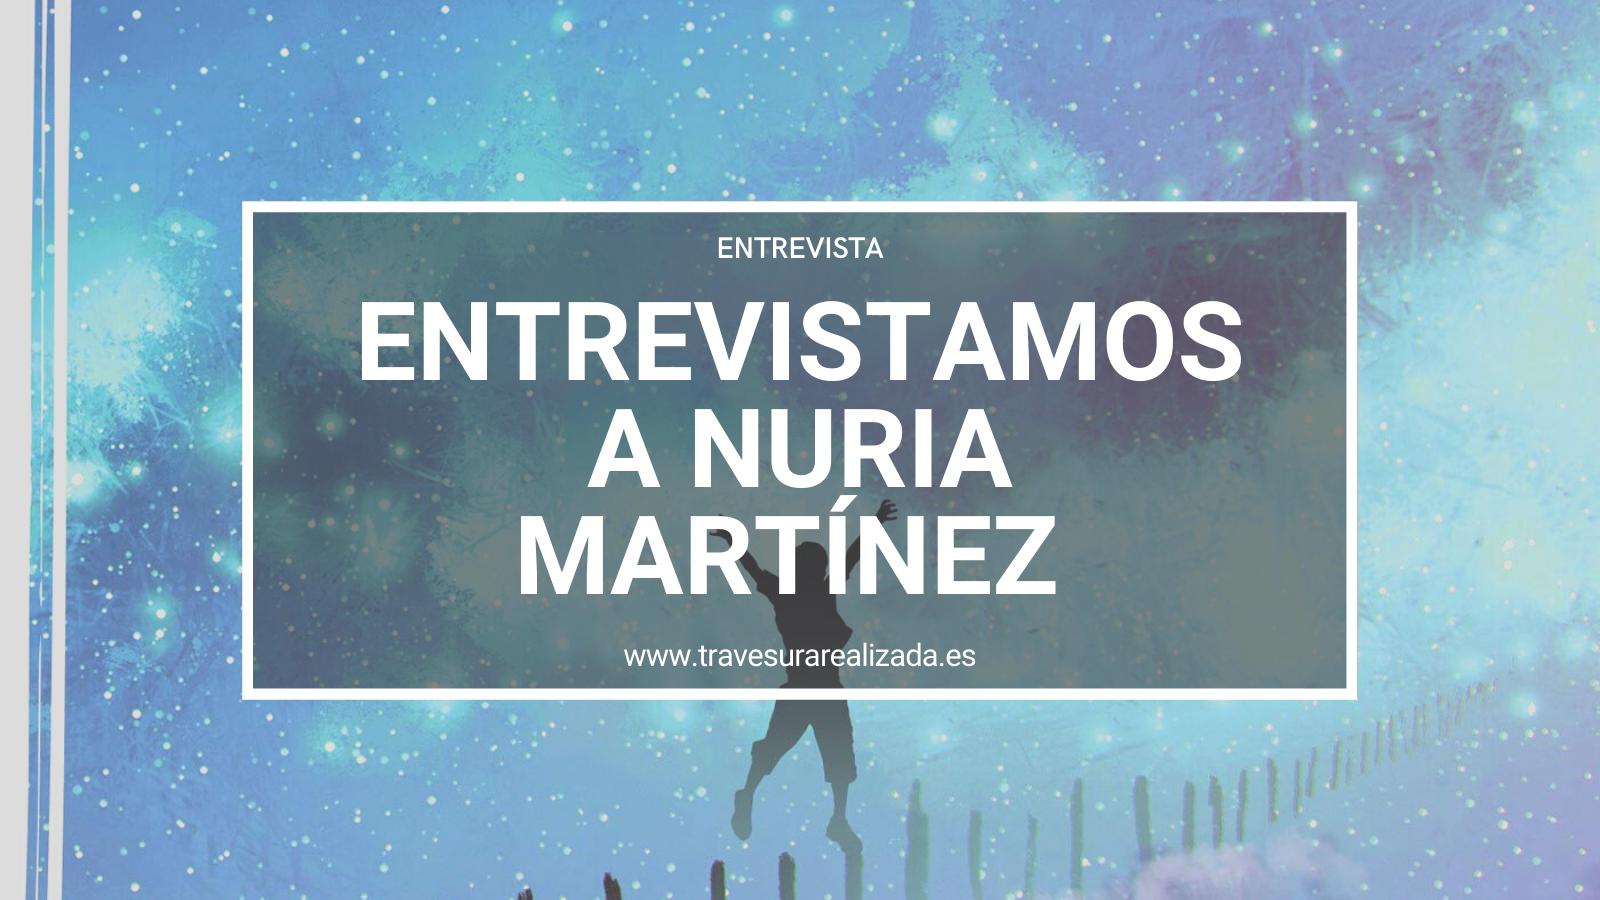 Entrevista Nuria Martínez por A.P.S.J